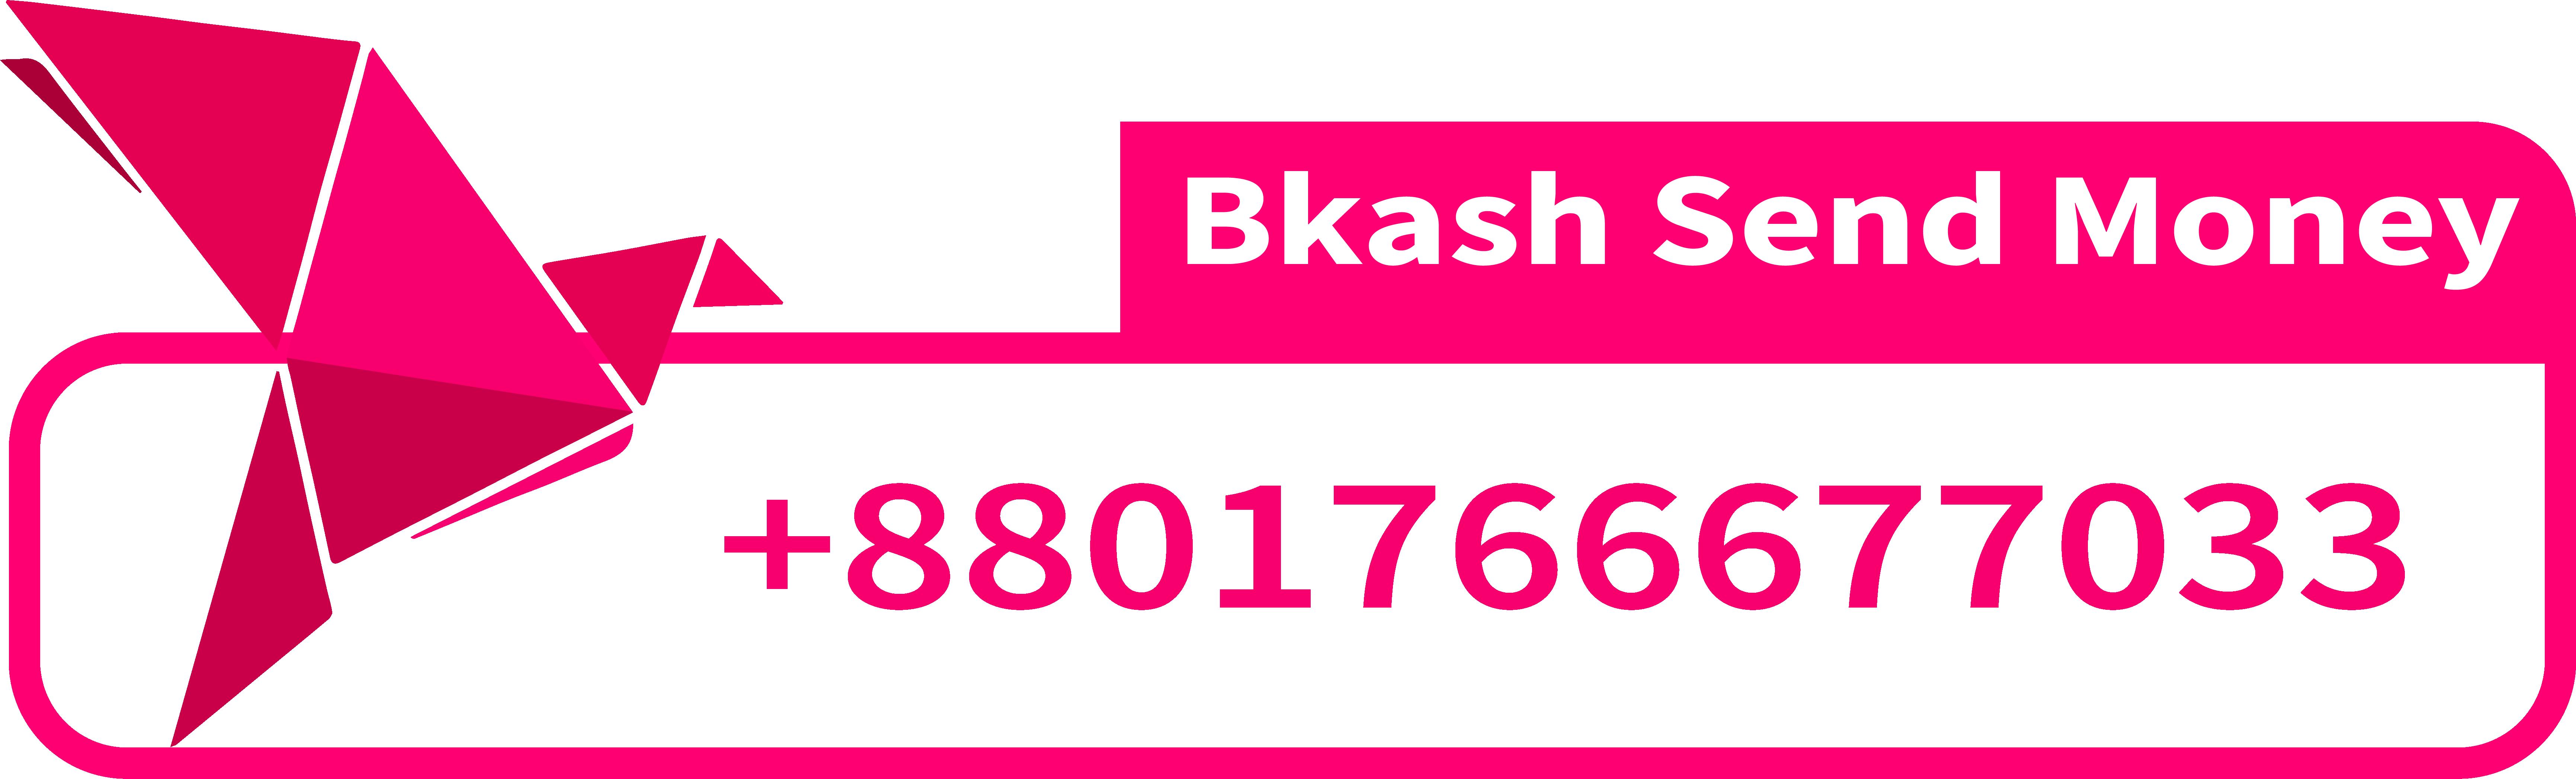 bkash line